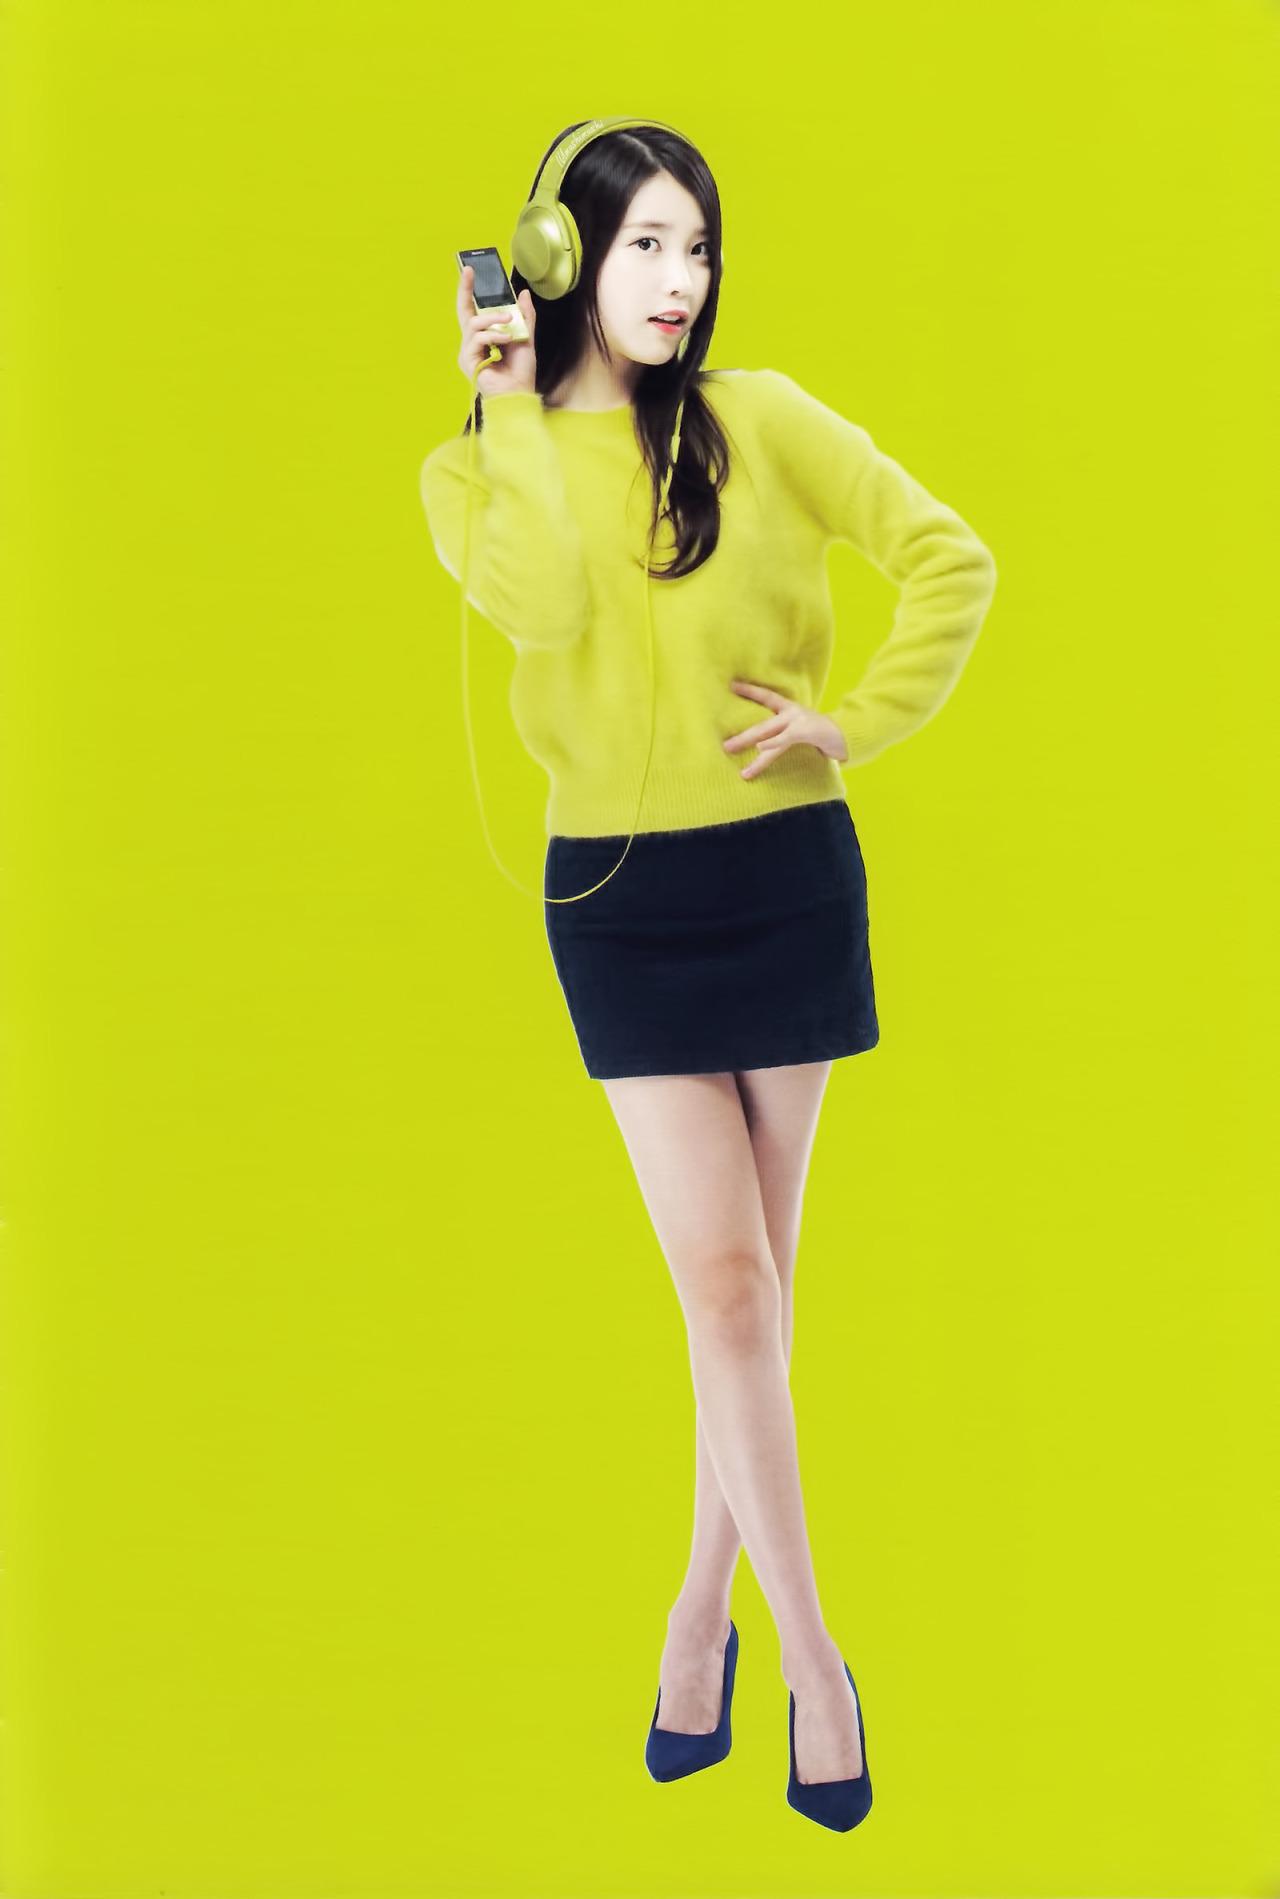 Iu Android Iphone Wallpaper 48621 Asiachan Kpop Image Board